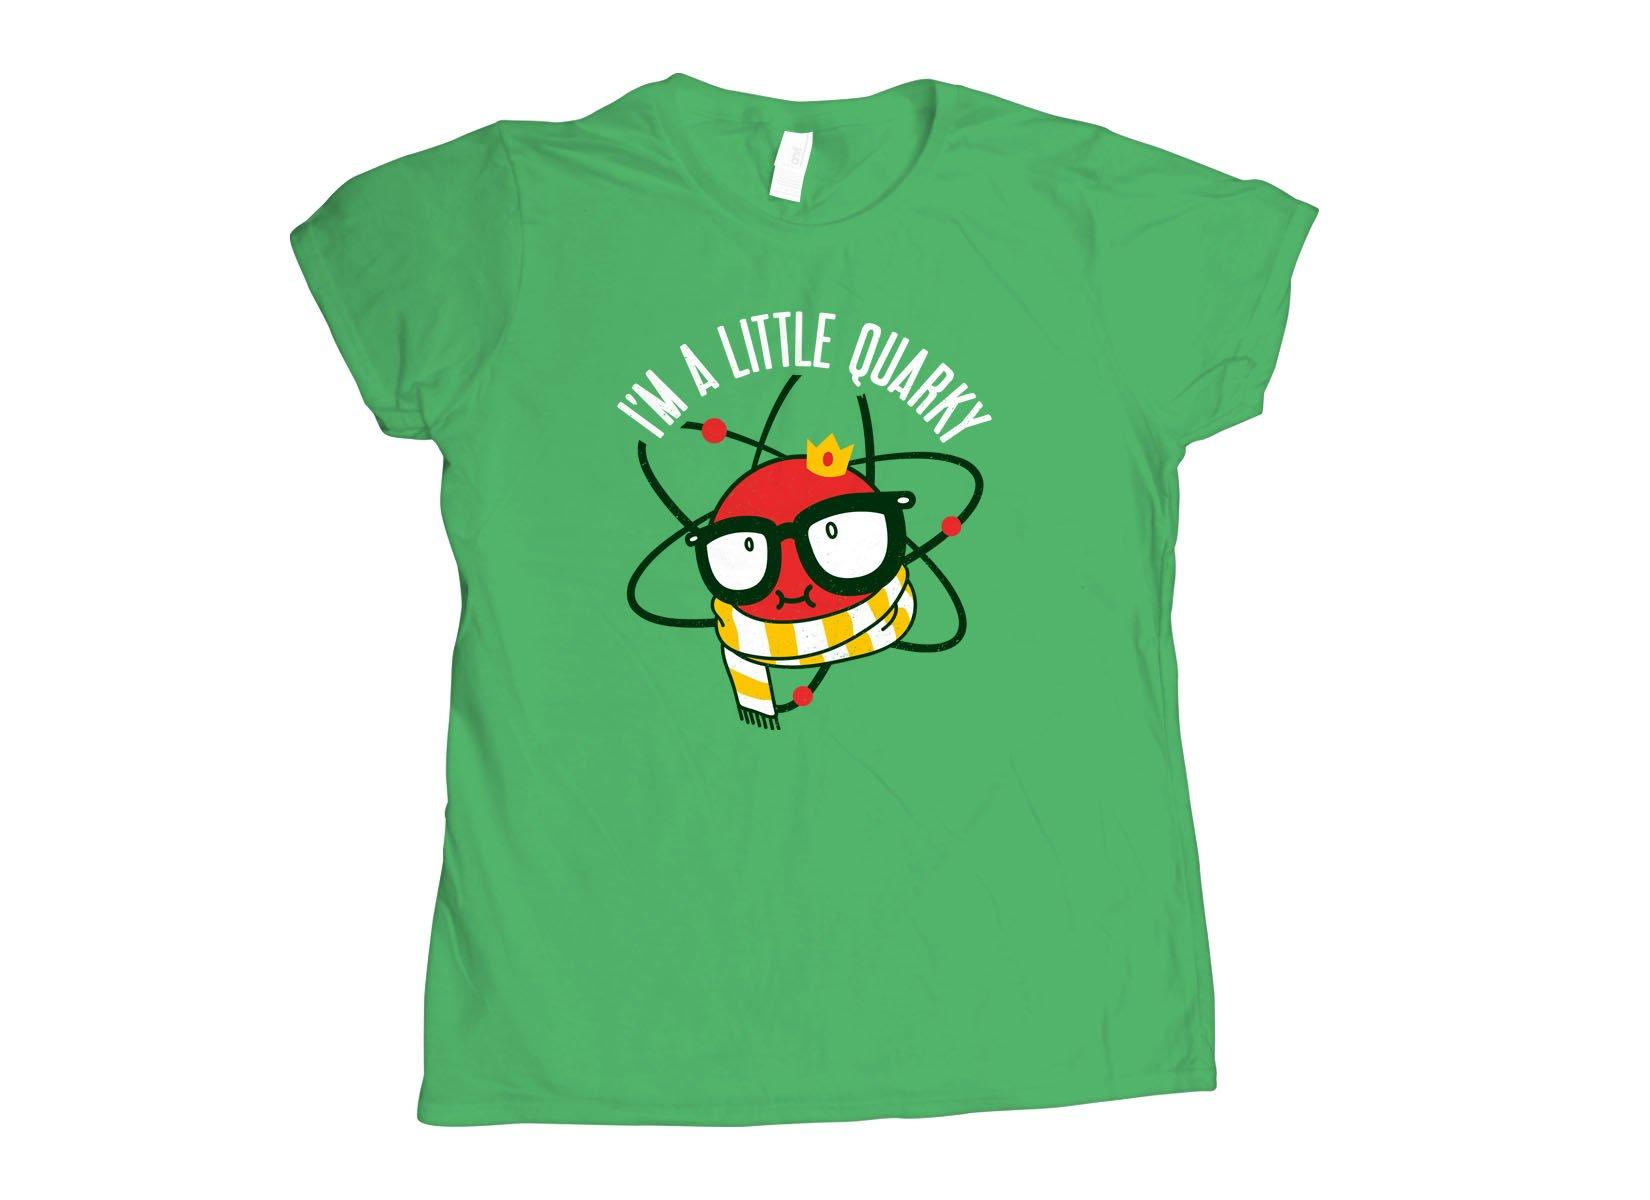 I'm A Little Quarky on Womens T-Shirt